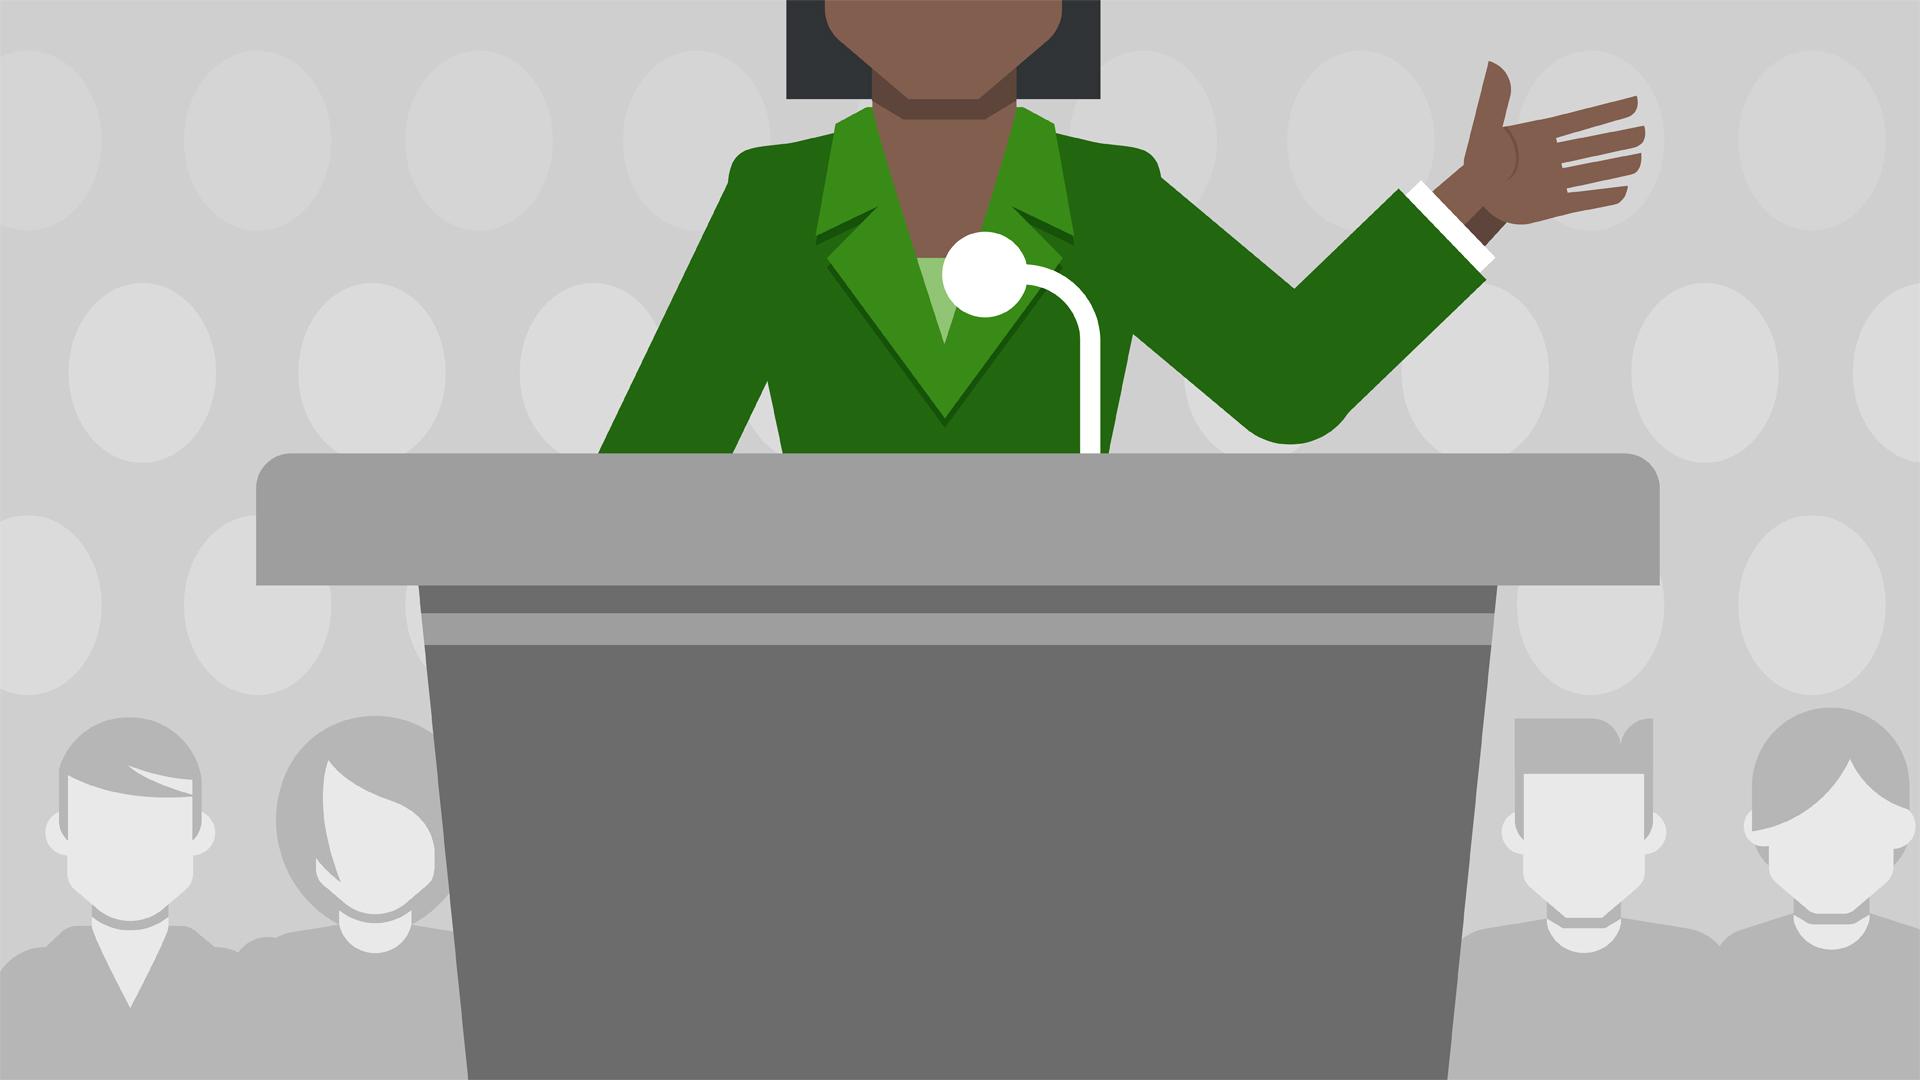 Public speaking clipart black and white Public Speaking Foundations black and white